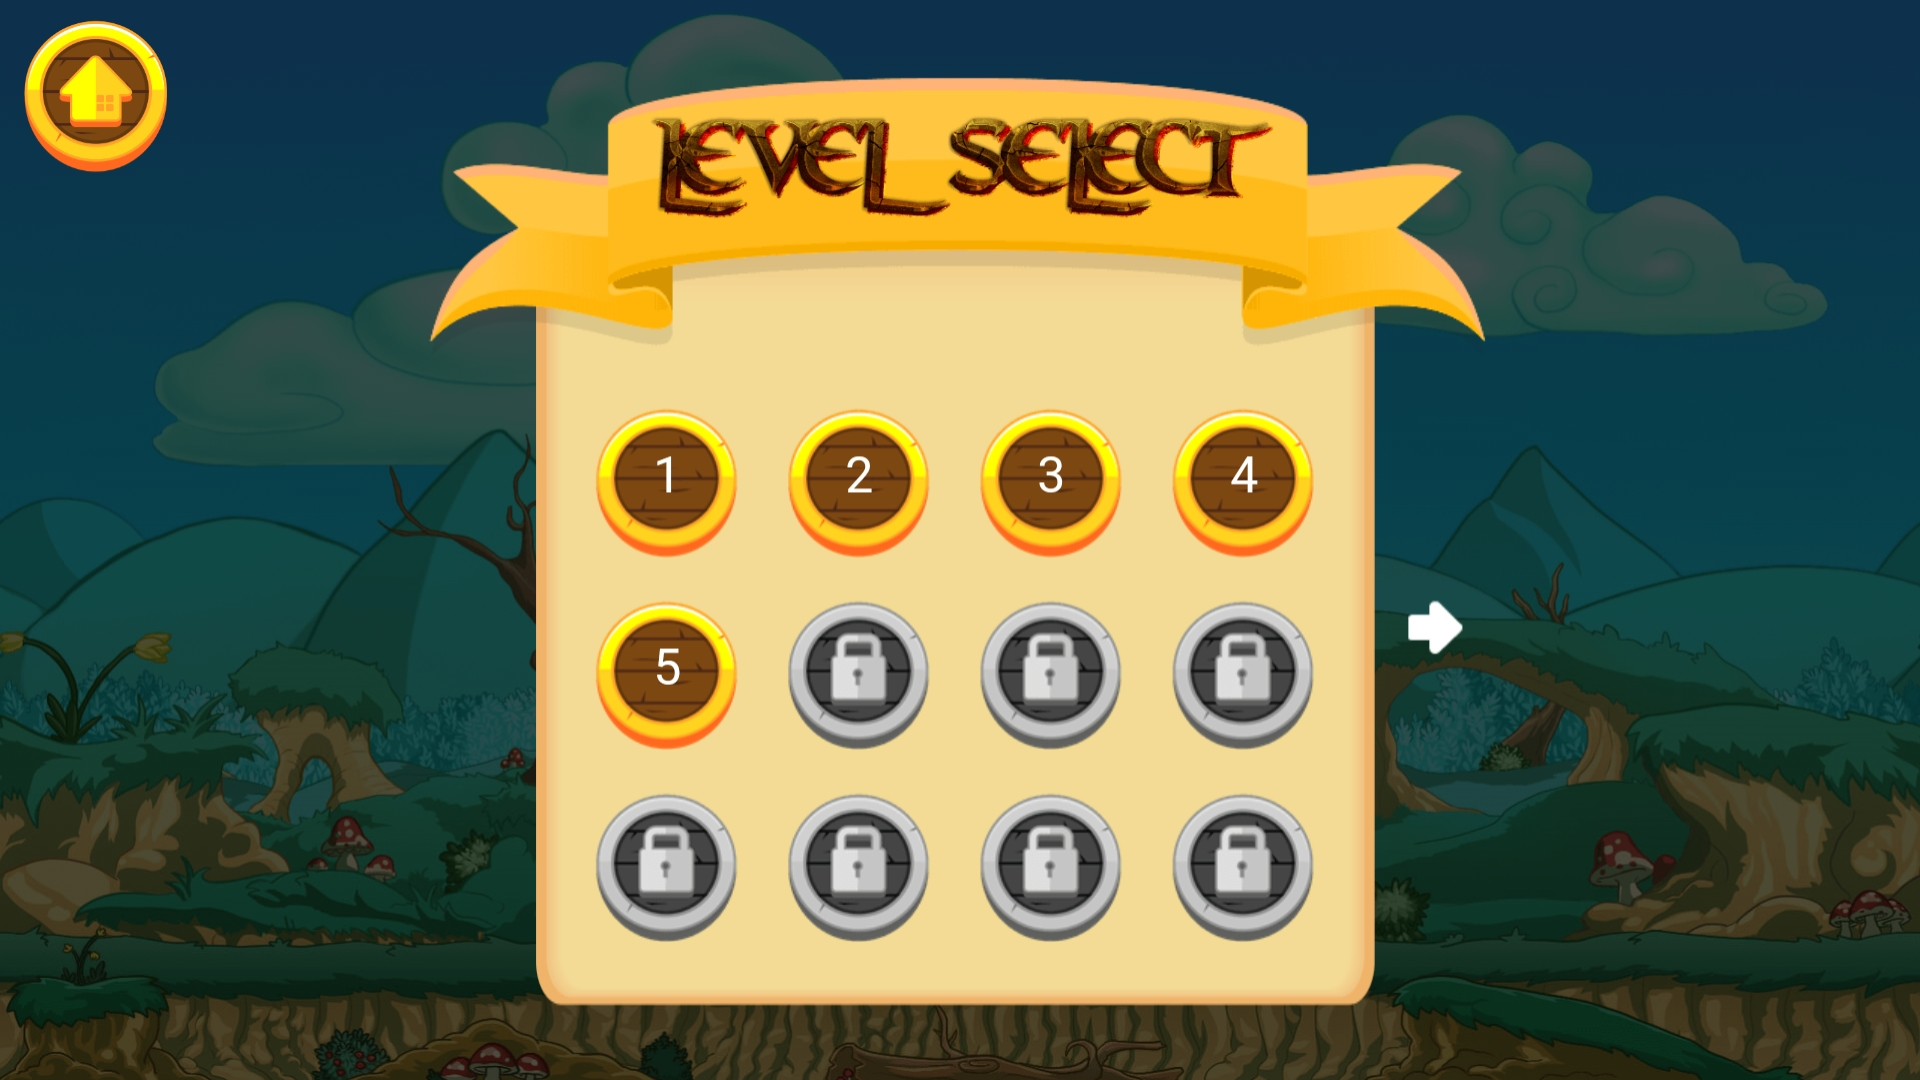 Black Assassin - HTML5 Game + Mobile Version (Construct 3 / C3P) - 5